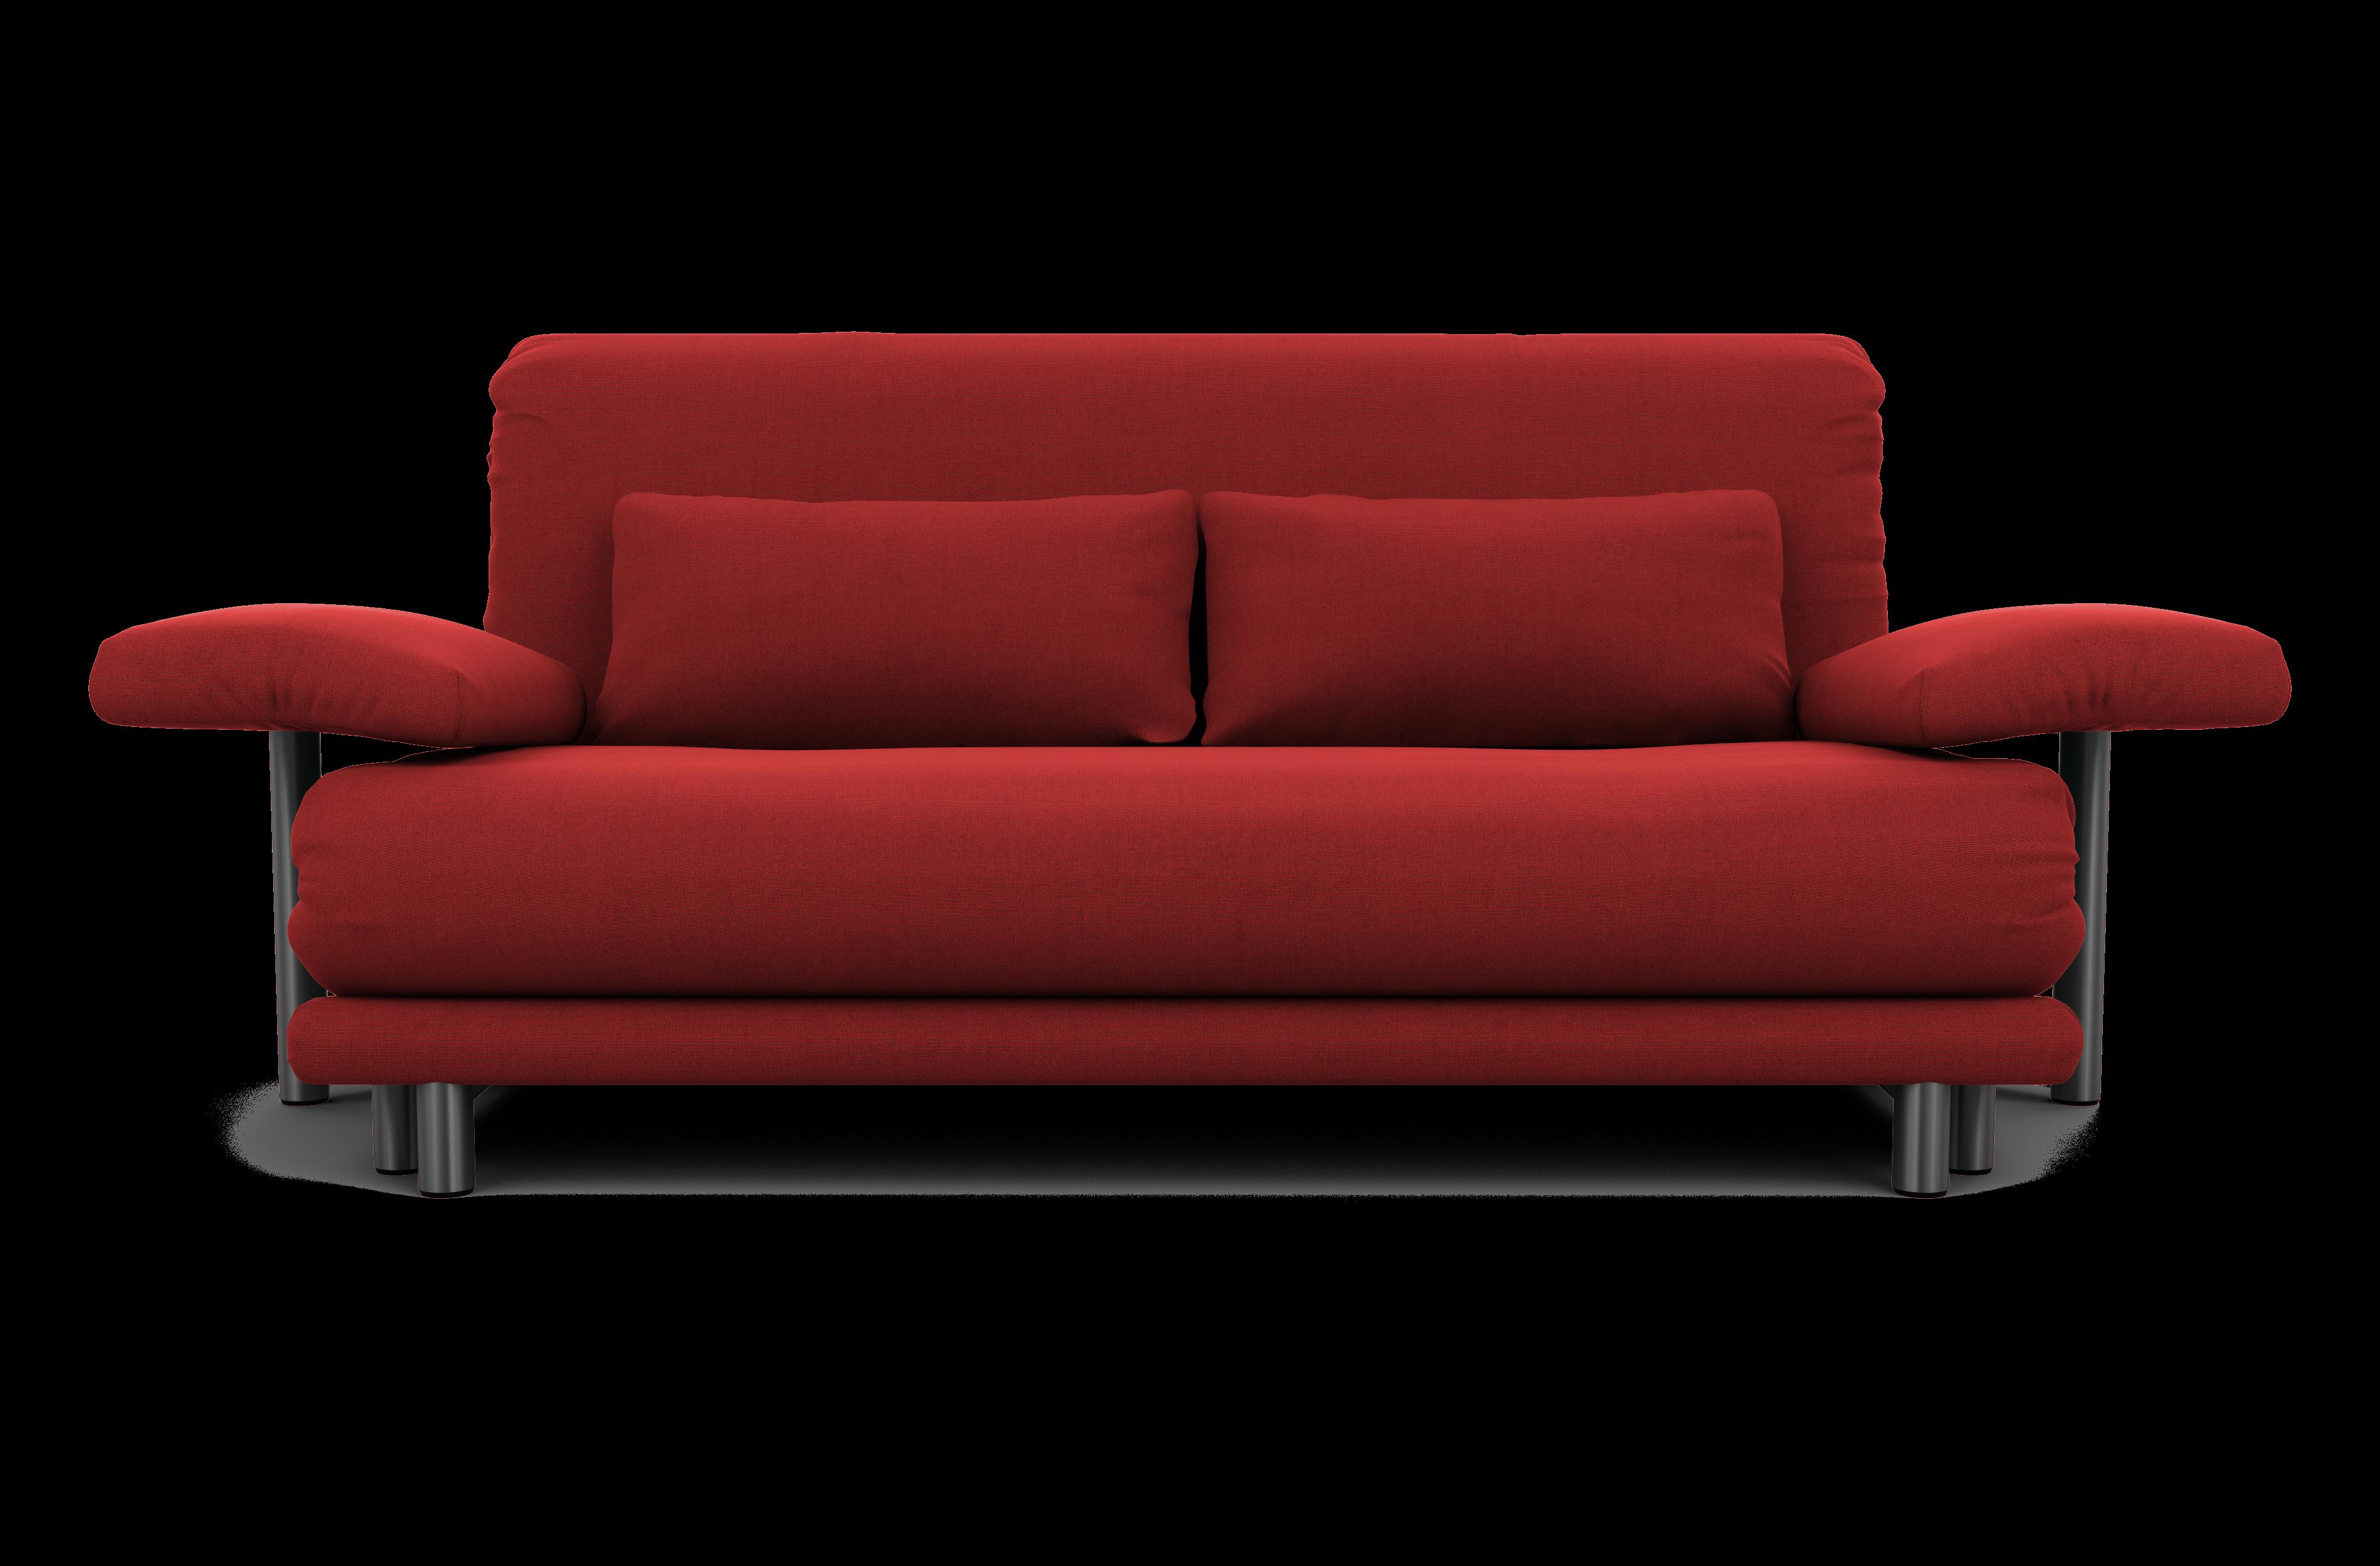 bettsofa multi ligne roset das beste aus wohndesign und. Black Bedroom Furniture Sets. Home Design Ideas